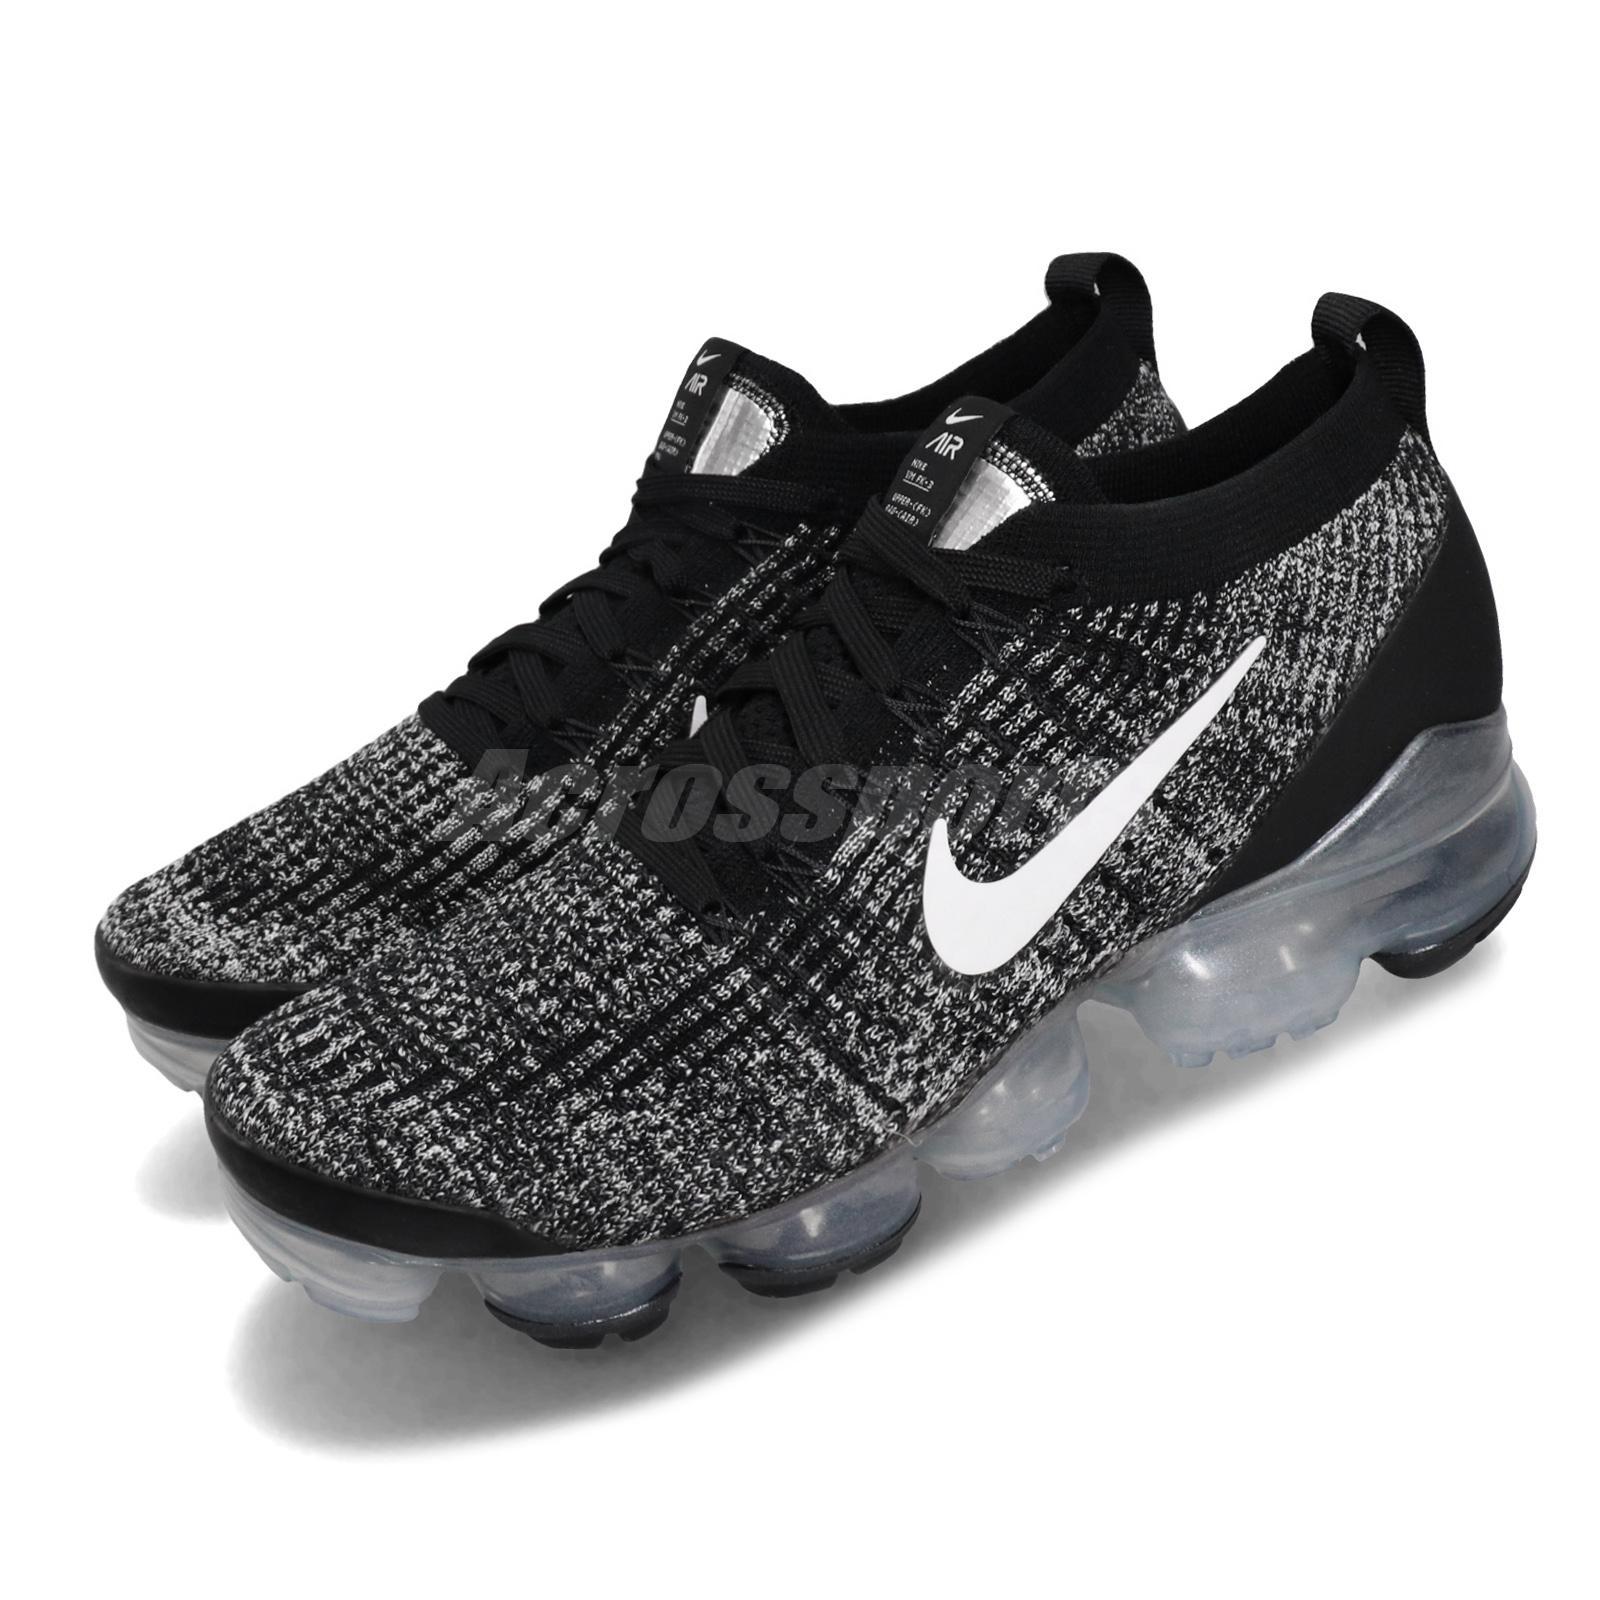 Nike Air Vapormax Flyknit 3 Black White